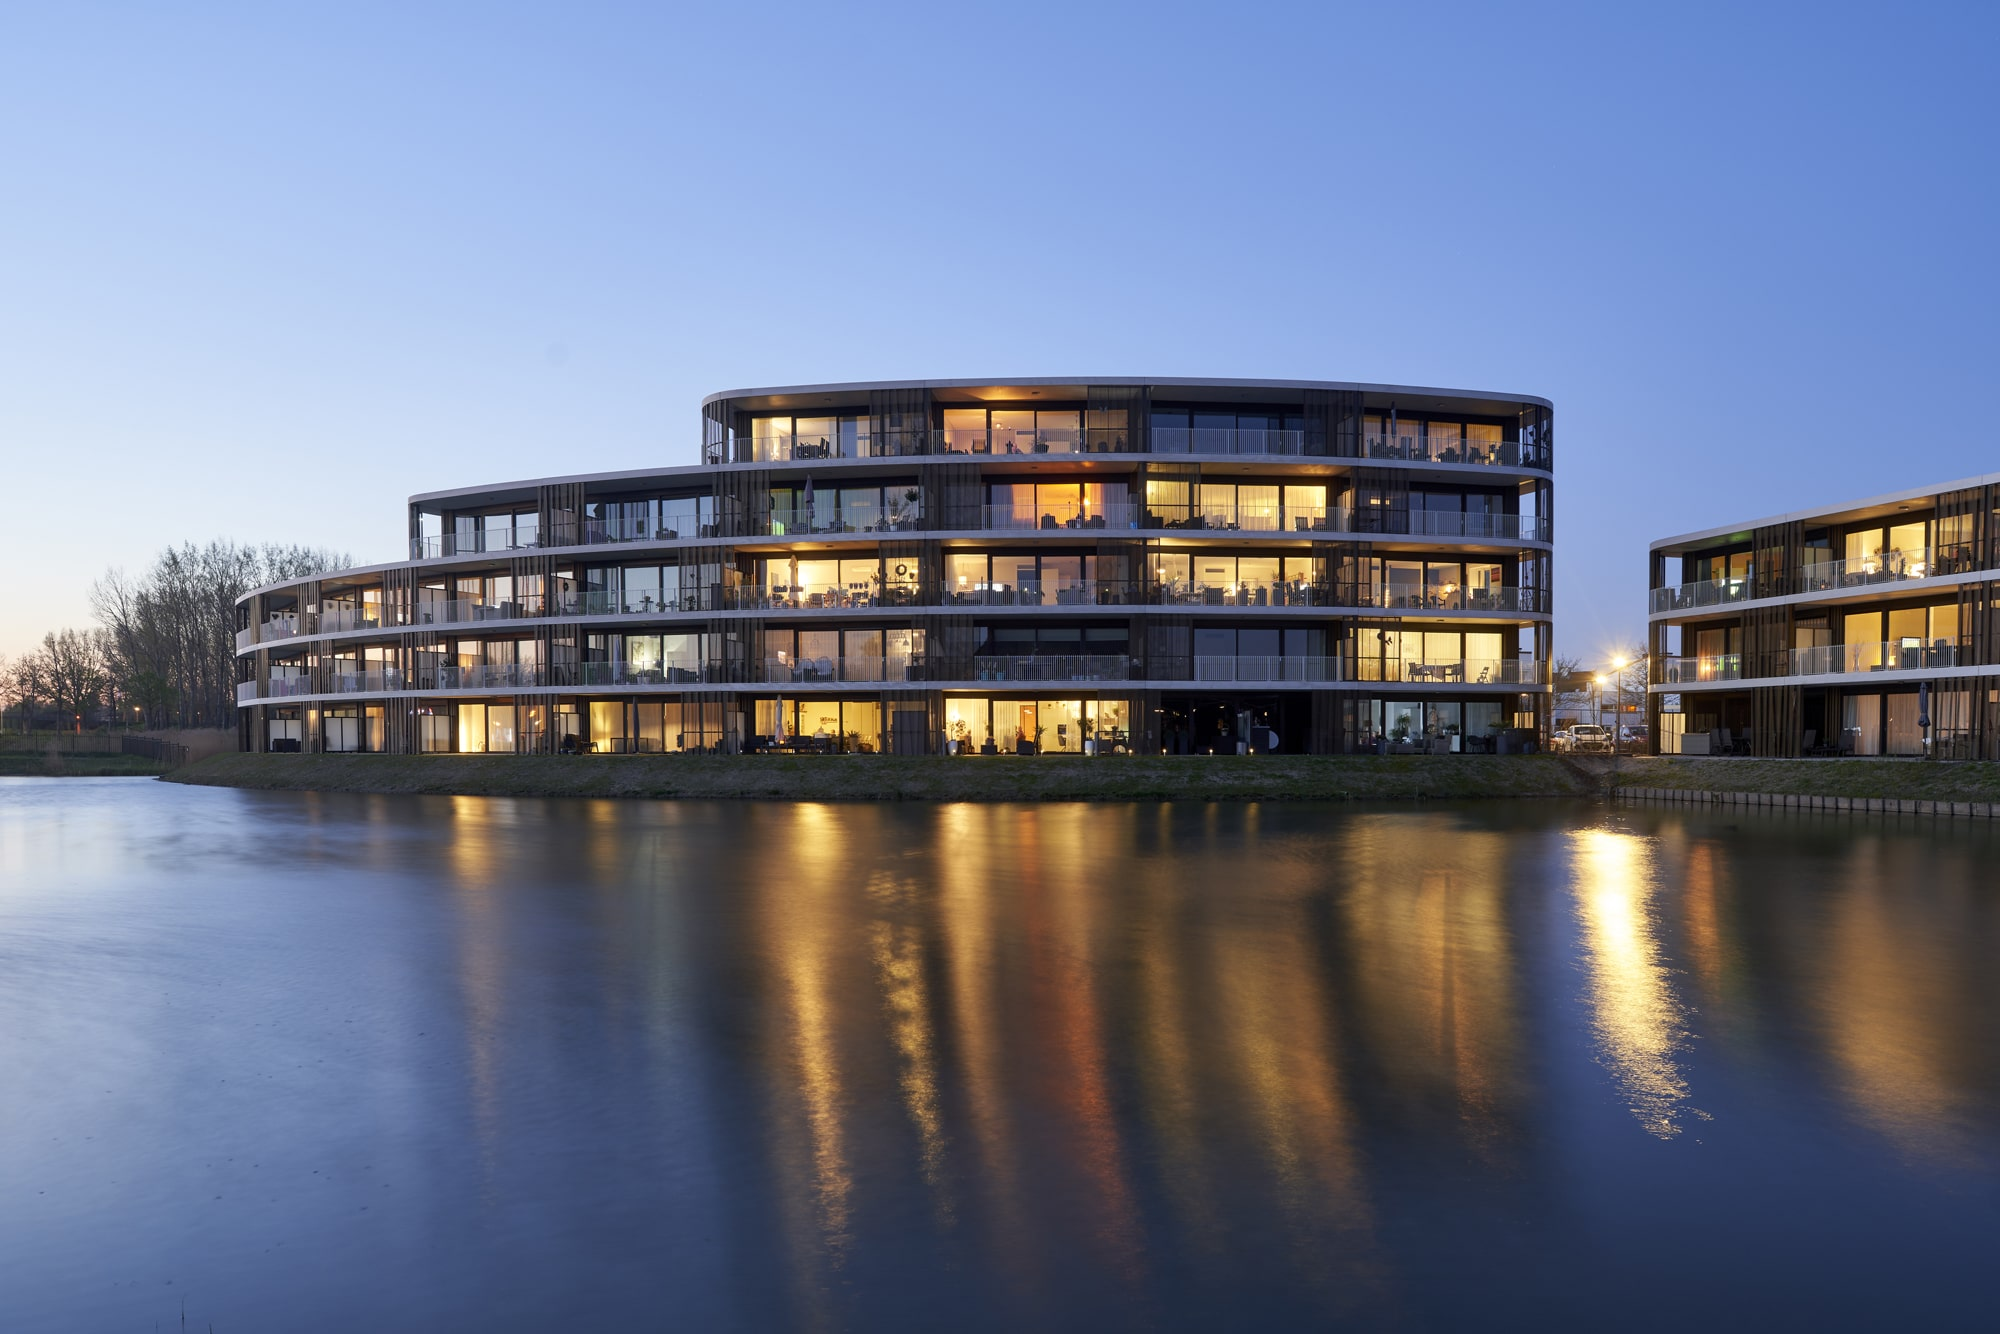 JMW architecten Sint Jakobsschelp Bergen op Zoom